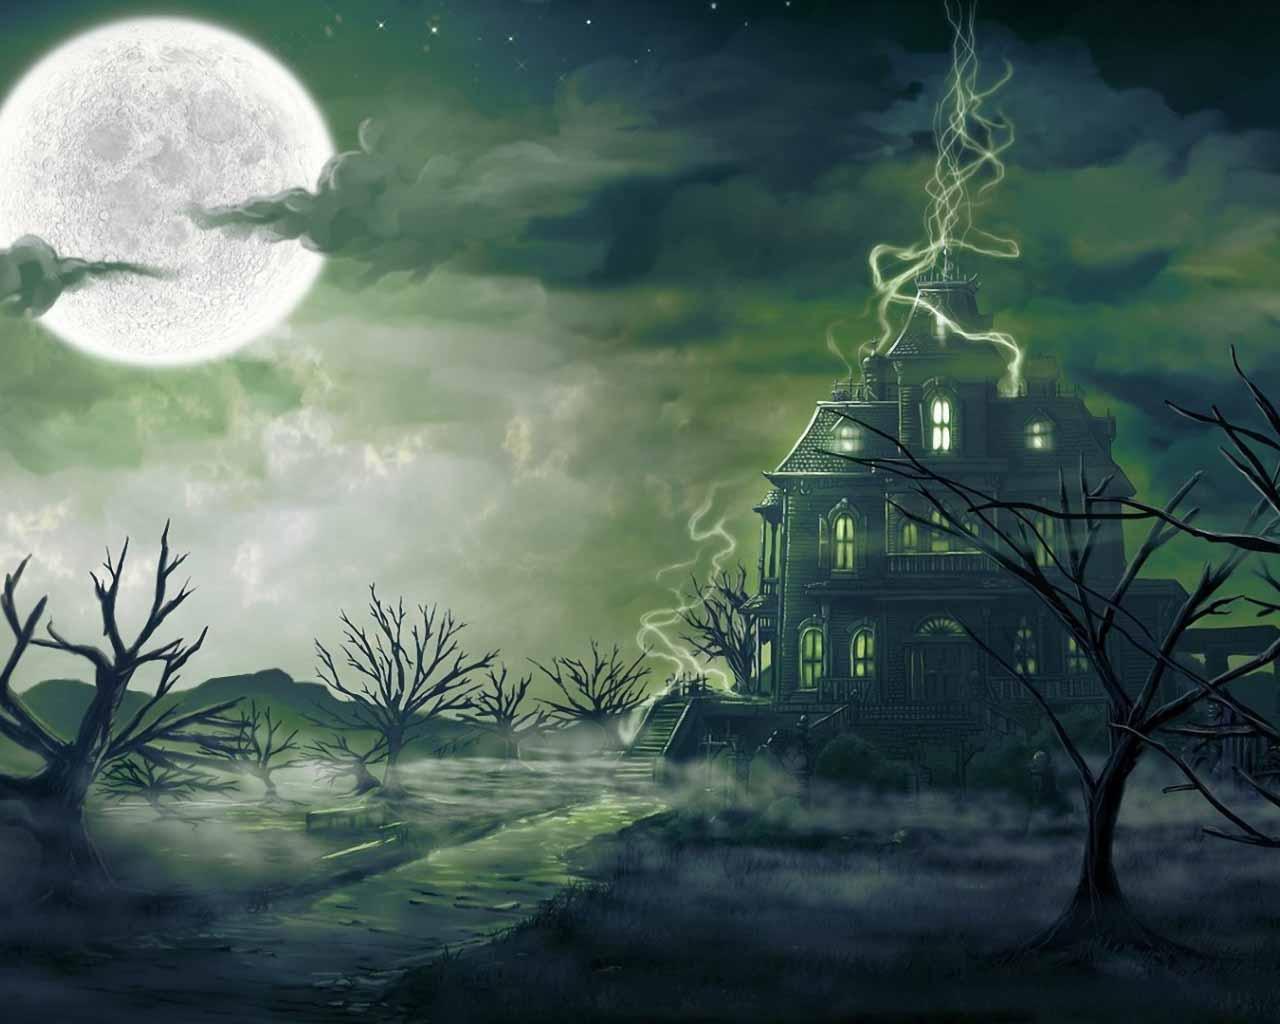 Hd Desktop Haunted Mansion 1920 X 1080 553 Kb Jpeg HD Wallpapers 1280x1024